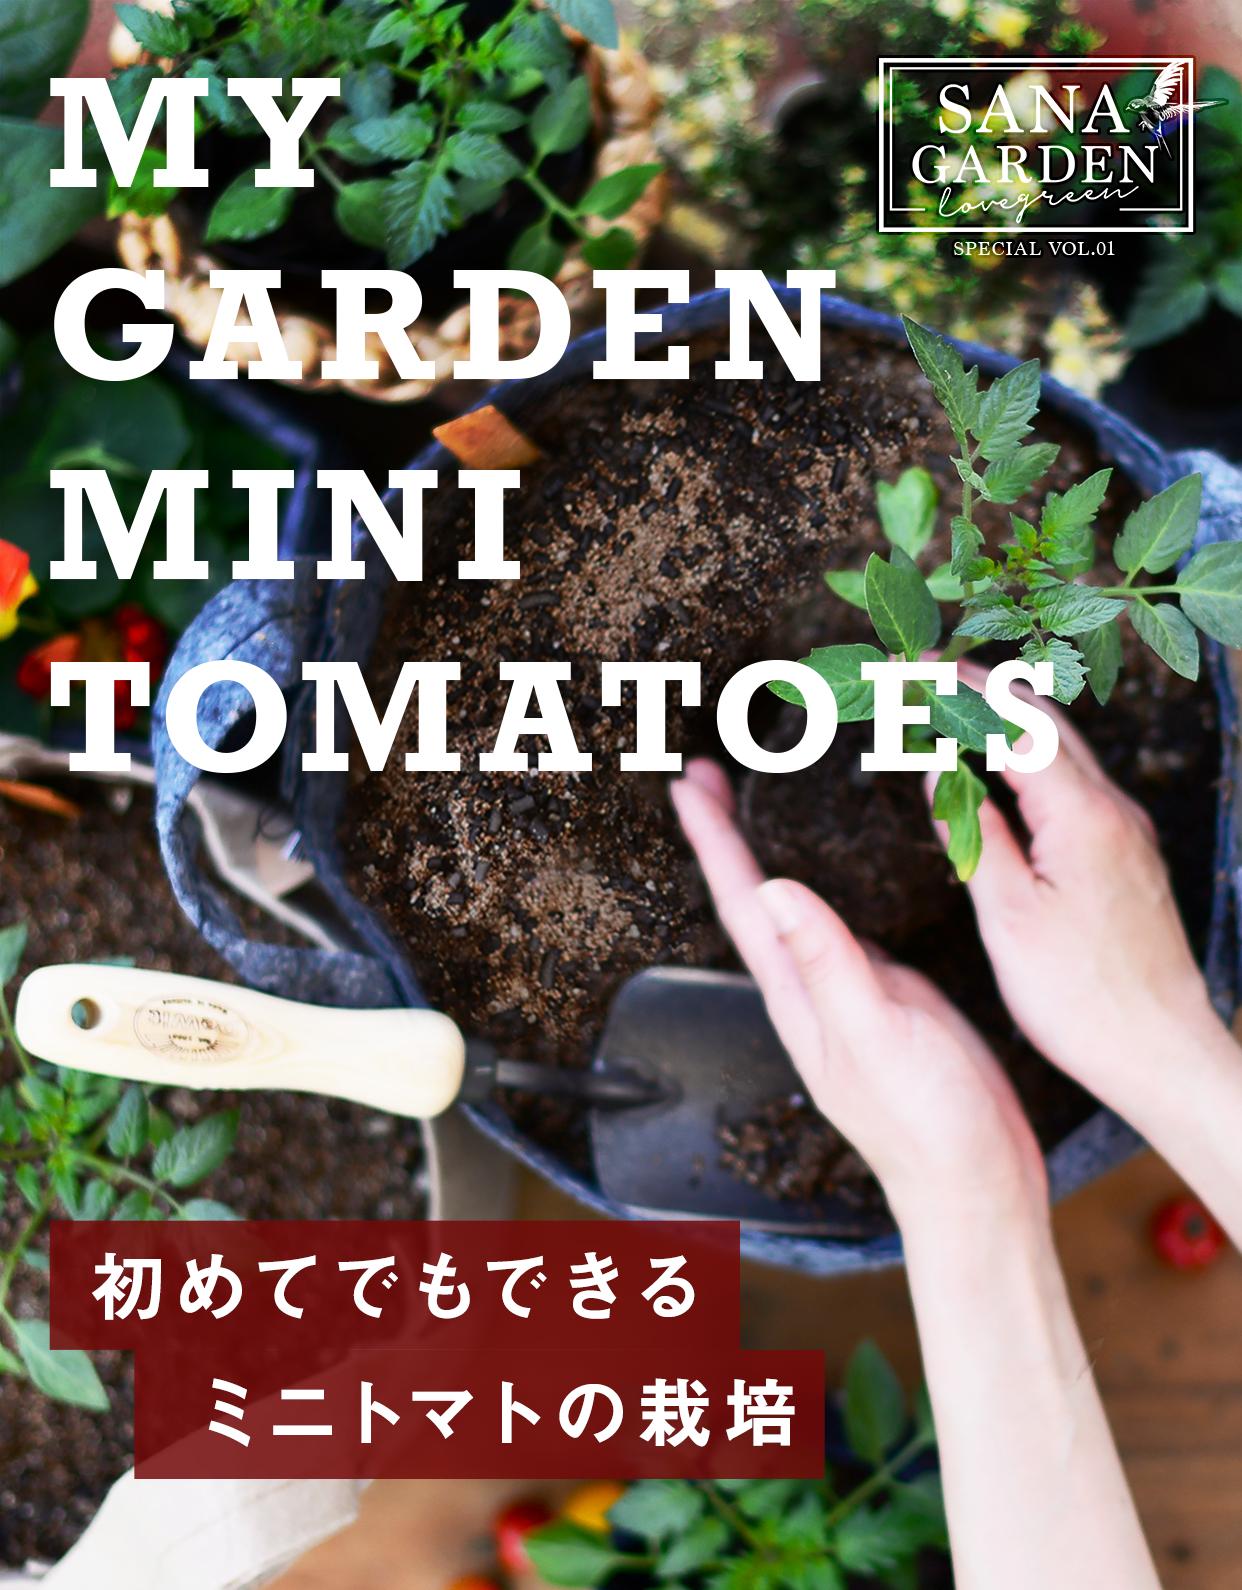 MY GARDEN MINI TOMATO 初めてでもできるミニトマトの栽培